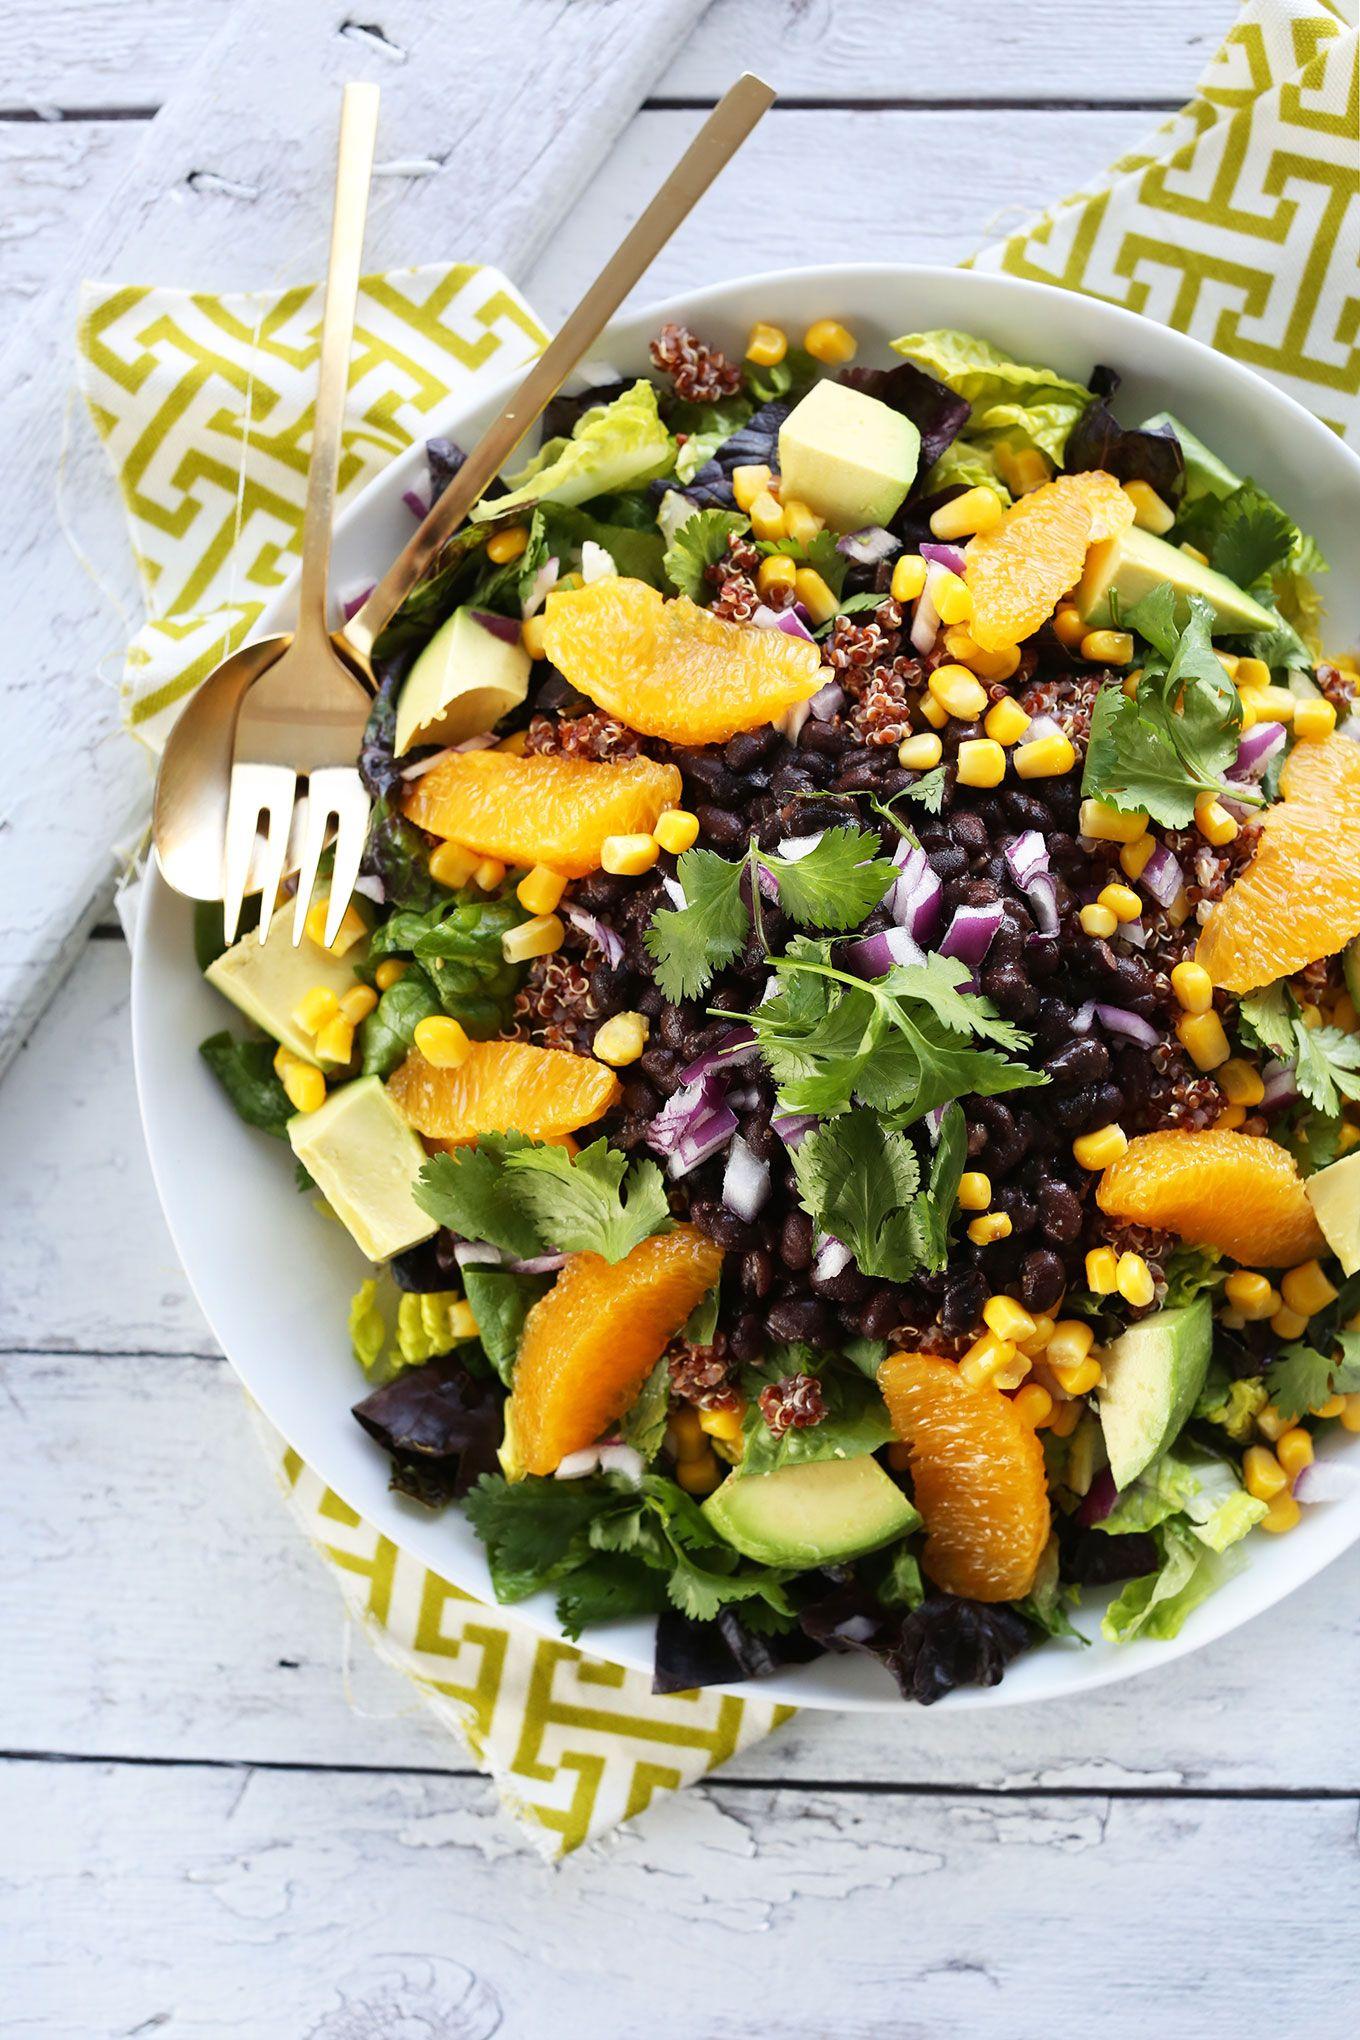 Avocado salad dressing vegan